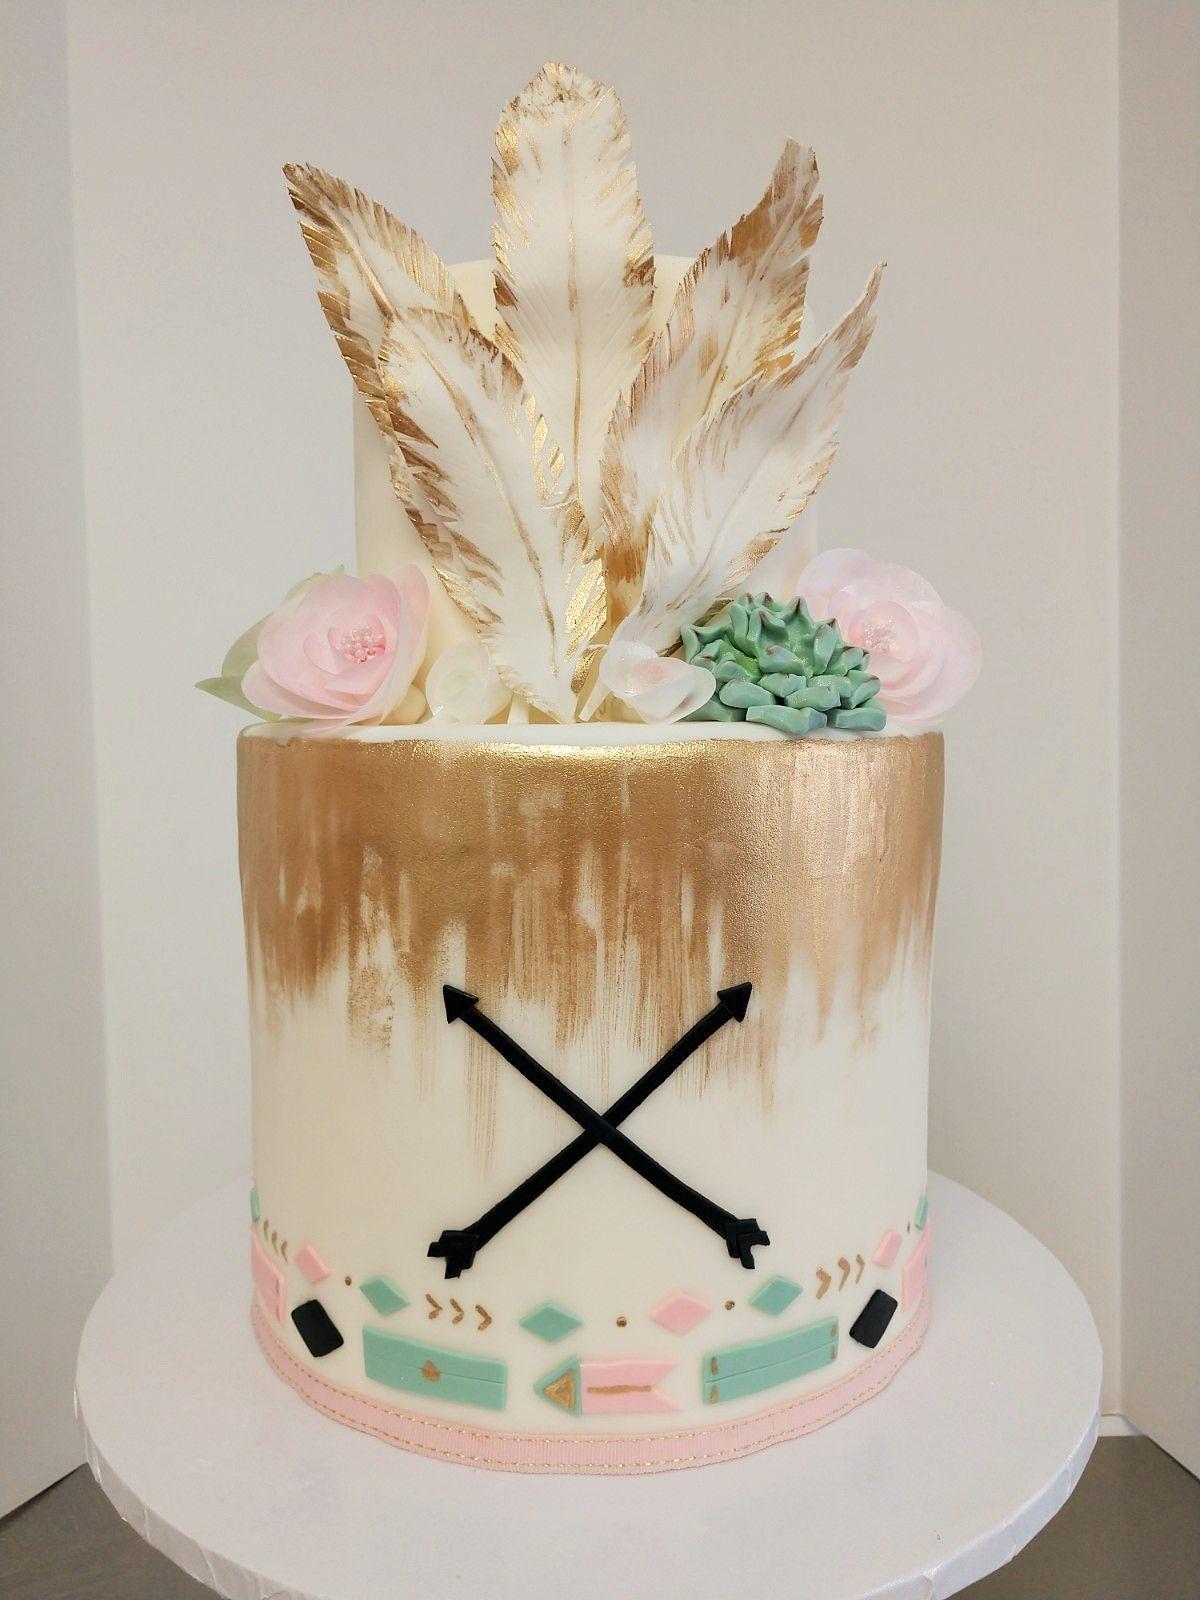 Boho Adventure Tribal Cake Boho Chic Baby Shower Birthday Cake Girls Baby Shower Cakes Girl Boho Cake